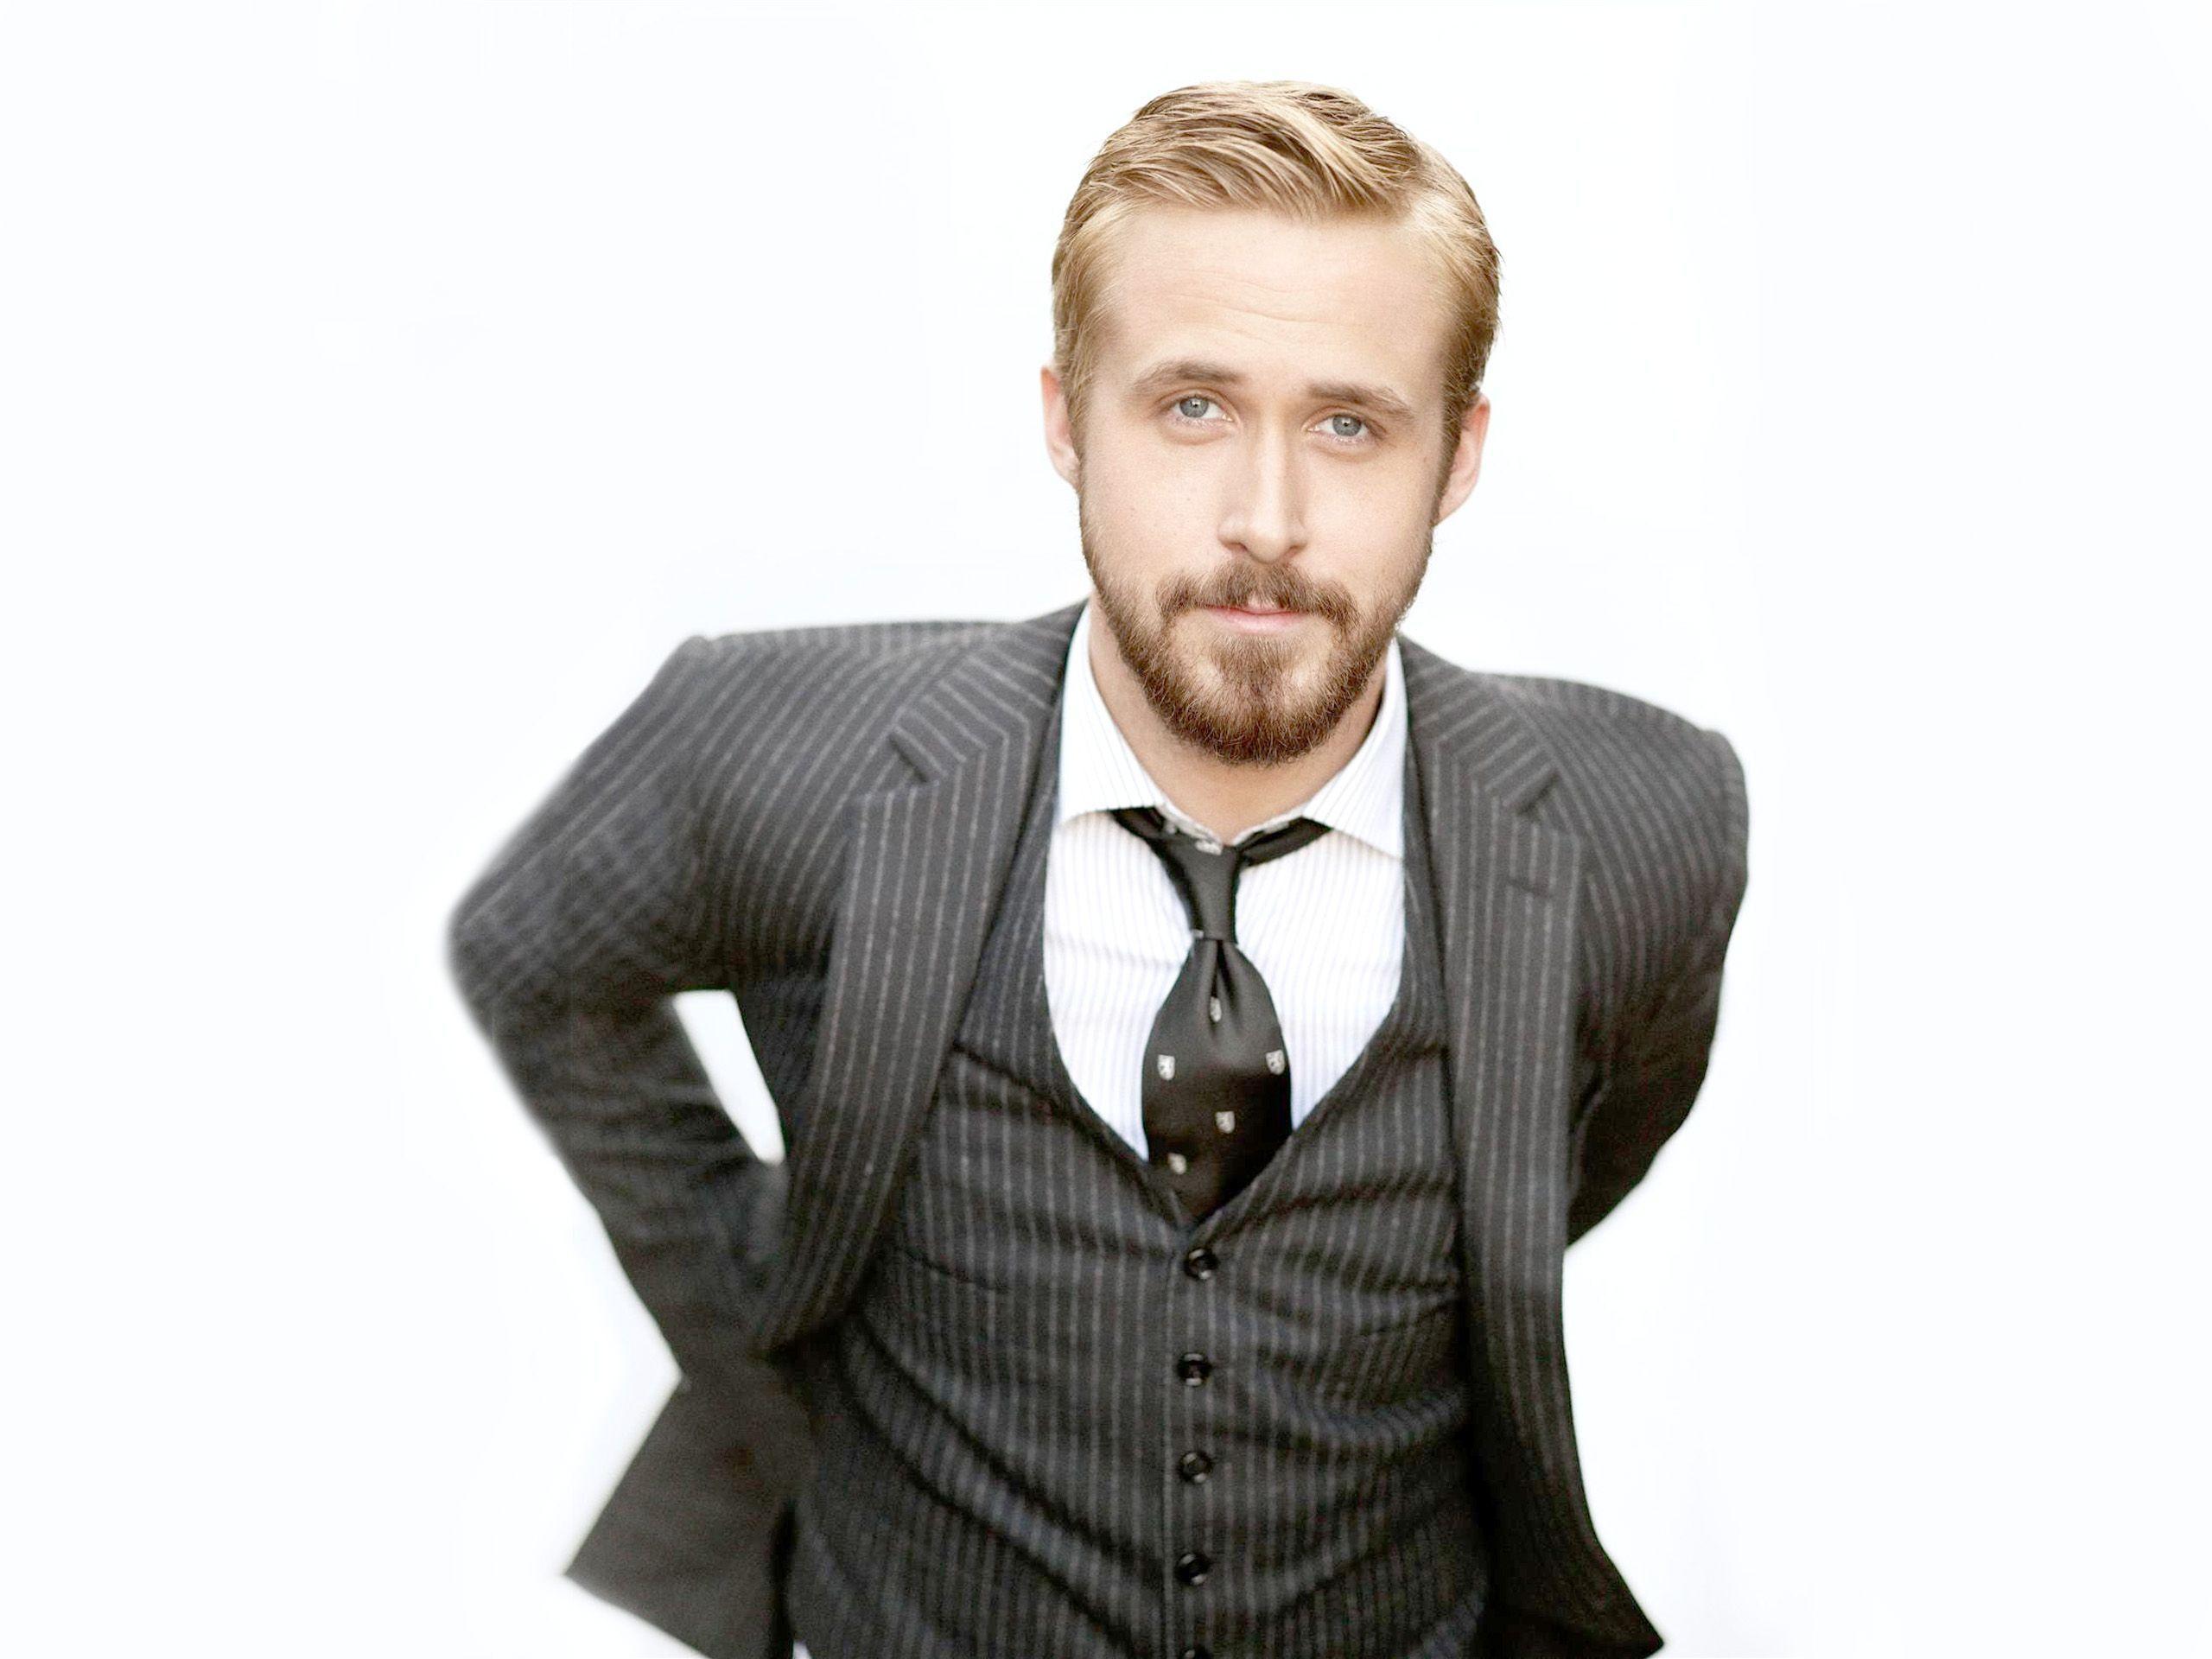 Ryan Gosling Wallpapers 2560x1920